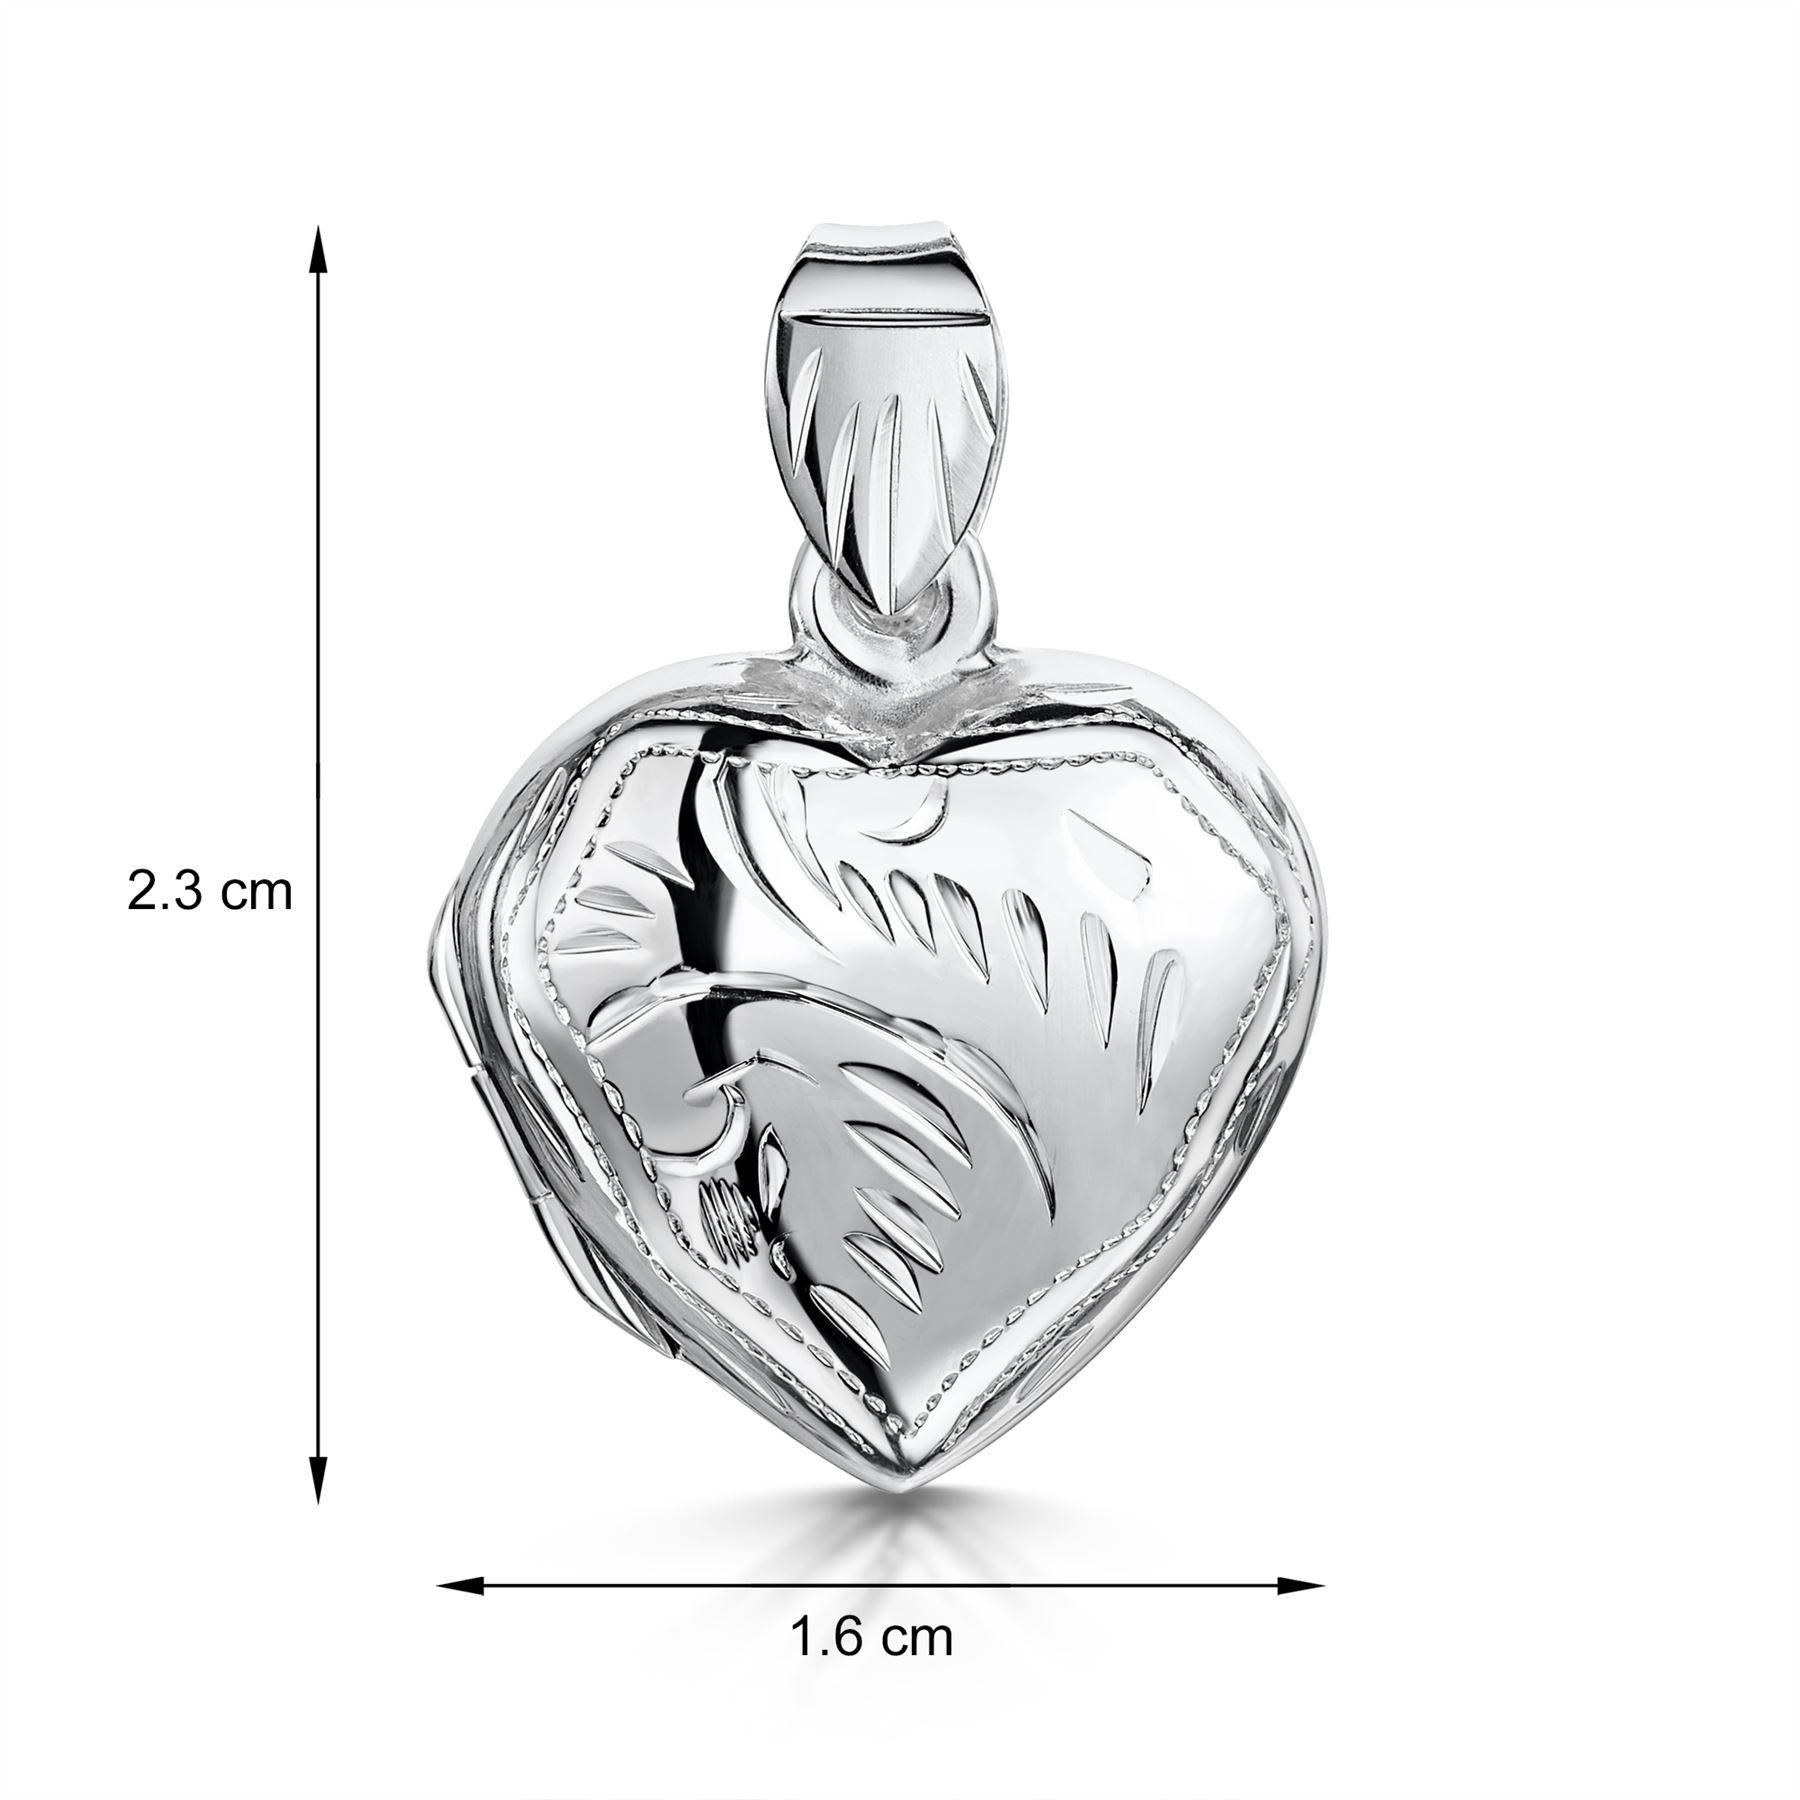 Amberta-Medallon-en-Fina-Plata-De-Ley-925-en-Formas-Diferentes-Para-Foto-y-Gemas miniatura 11